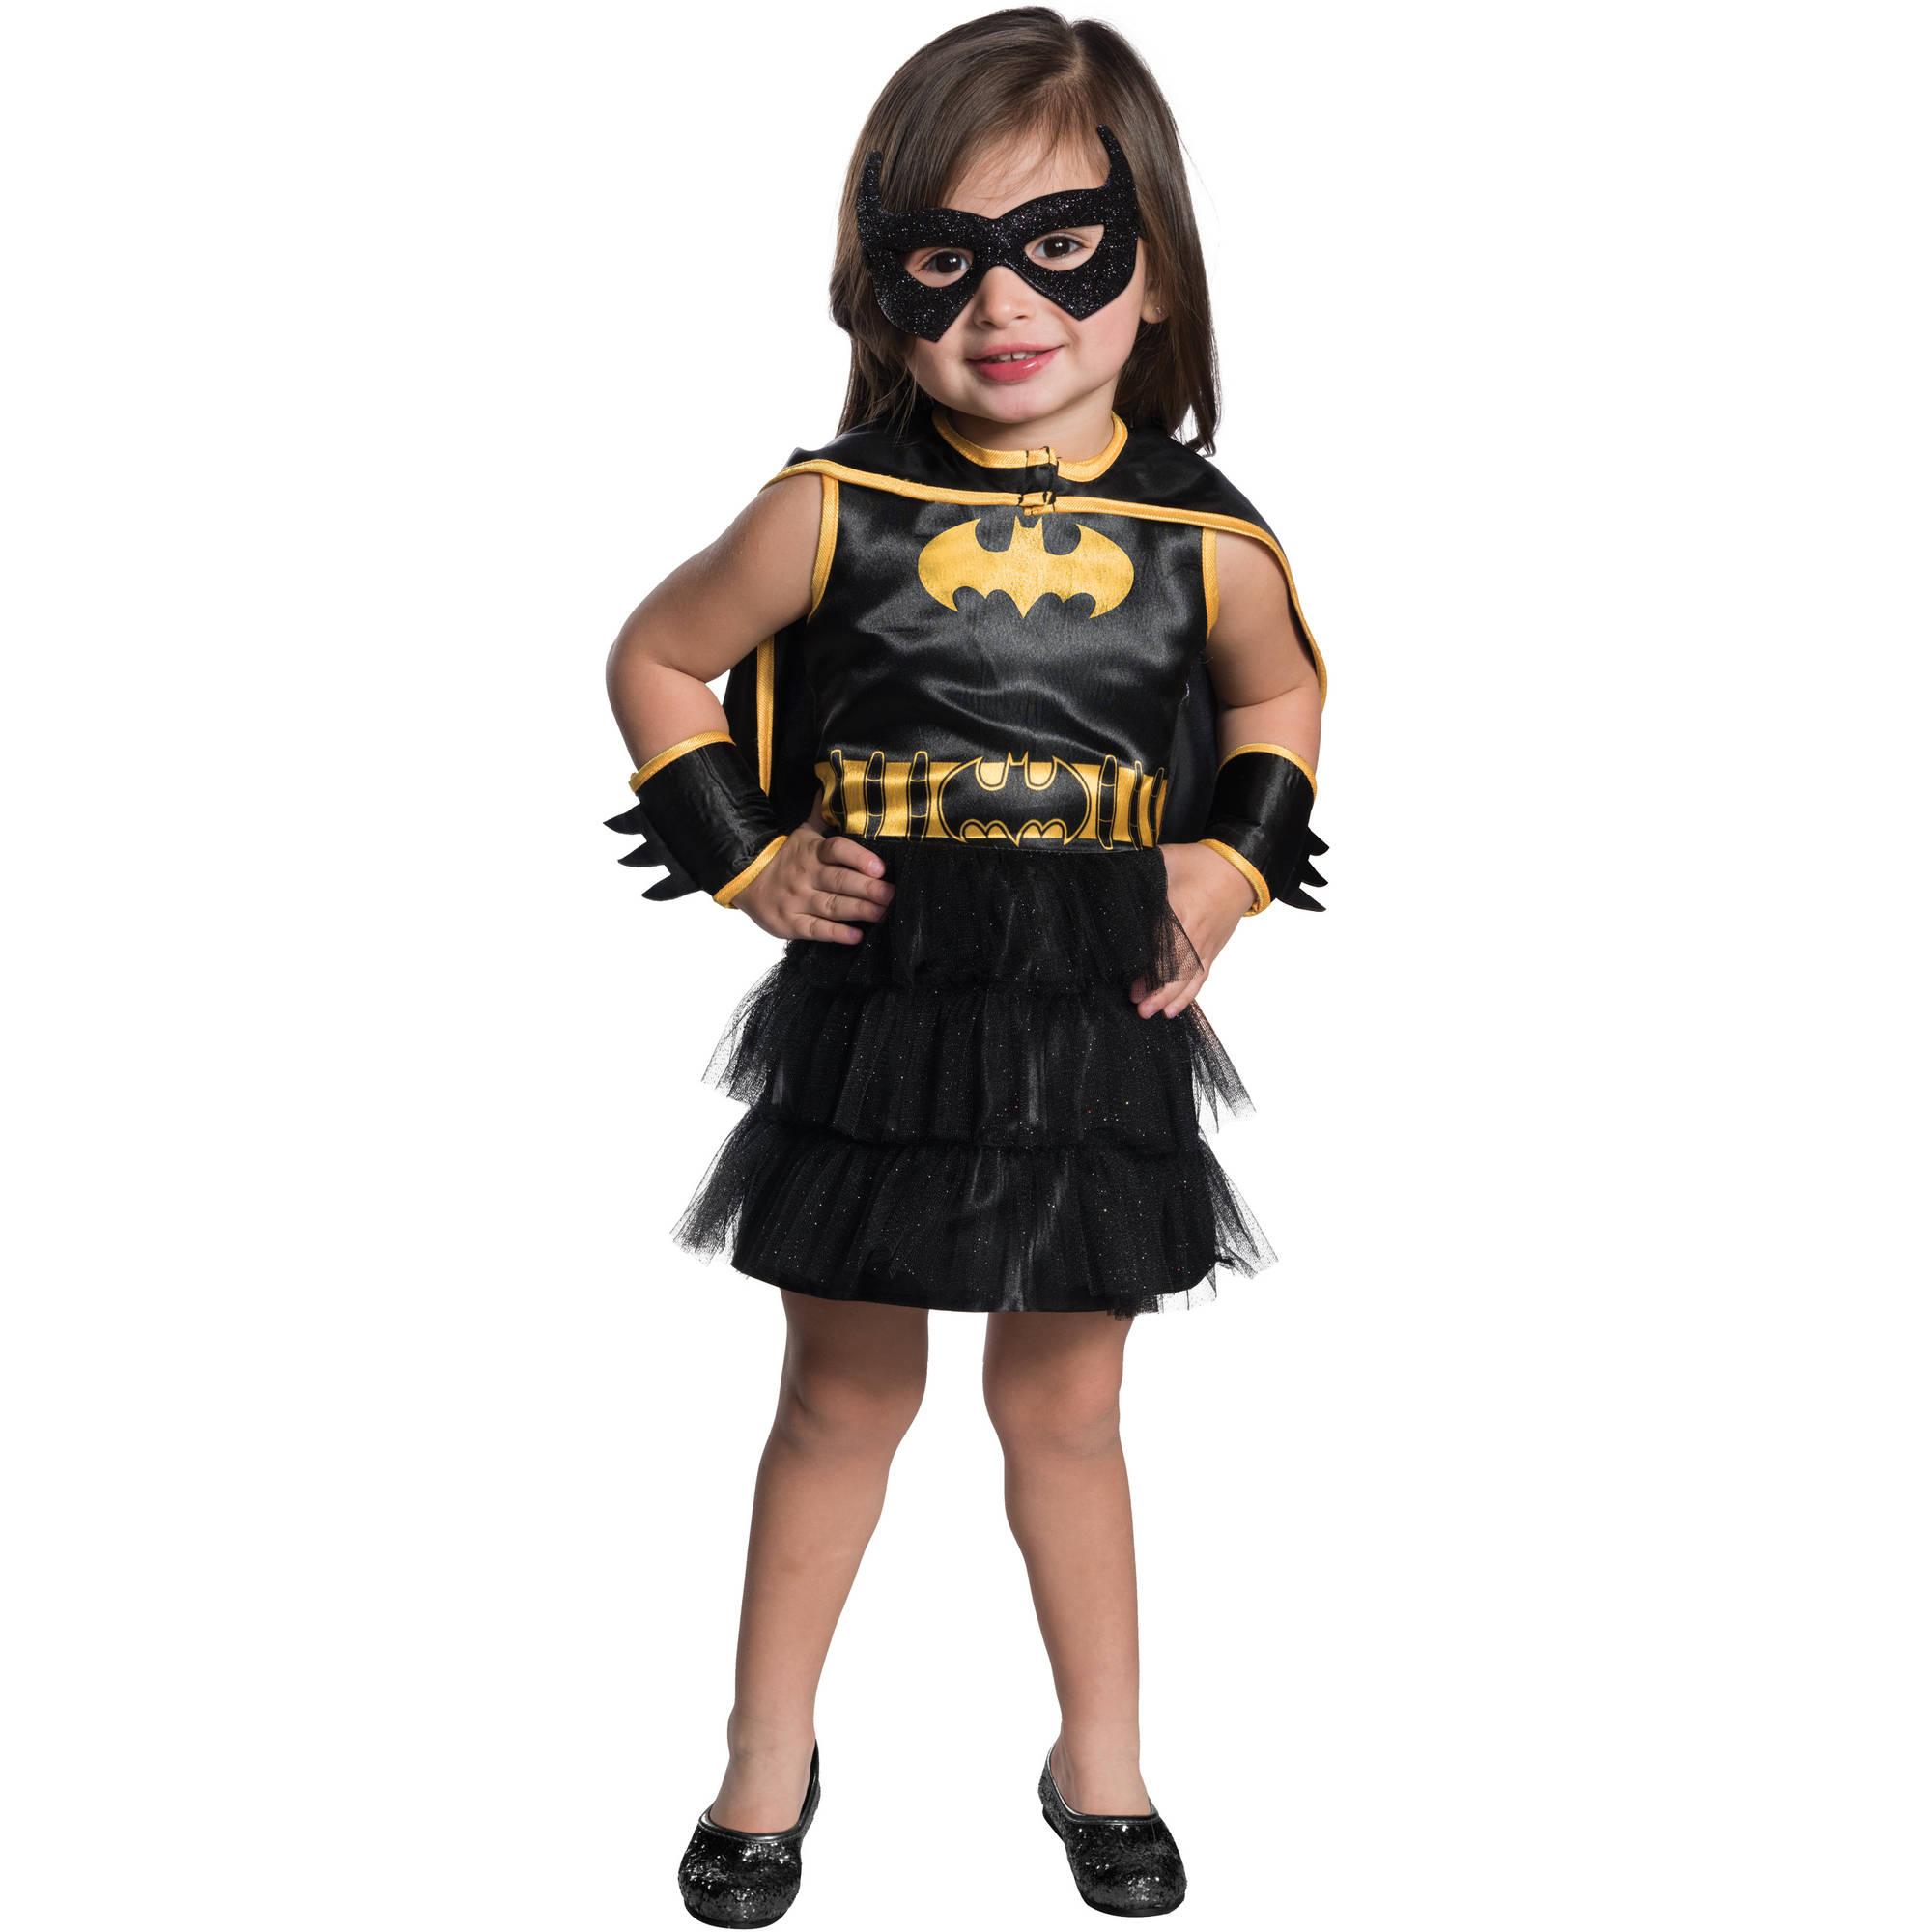 Batgirl Black and Gold Toddler's Tutu, 3T-4T